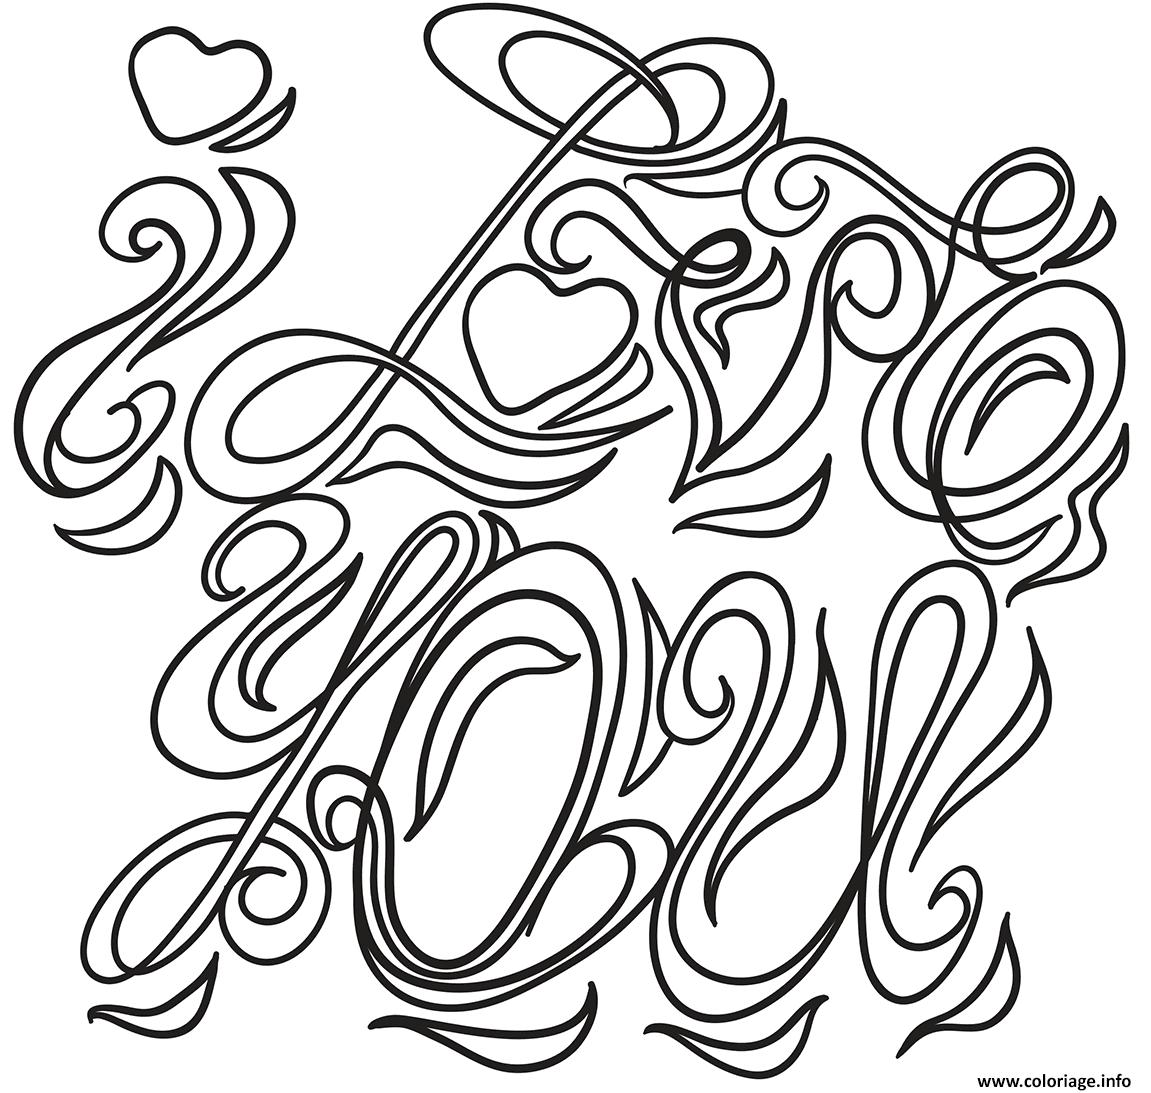 Coloriage I Love You Saint Valentin Jecoloriecom